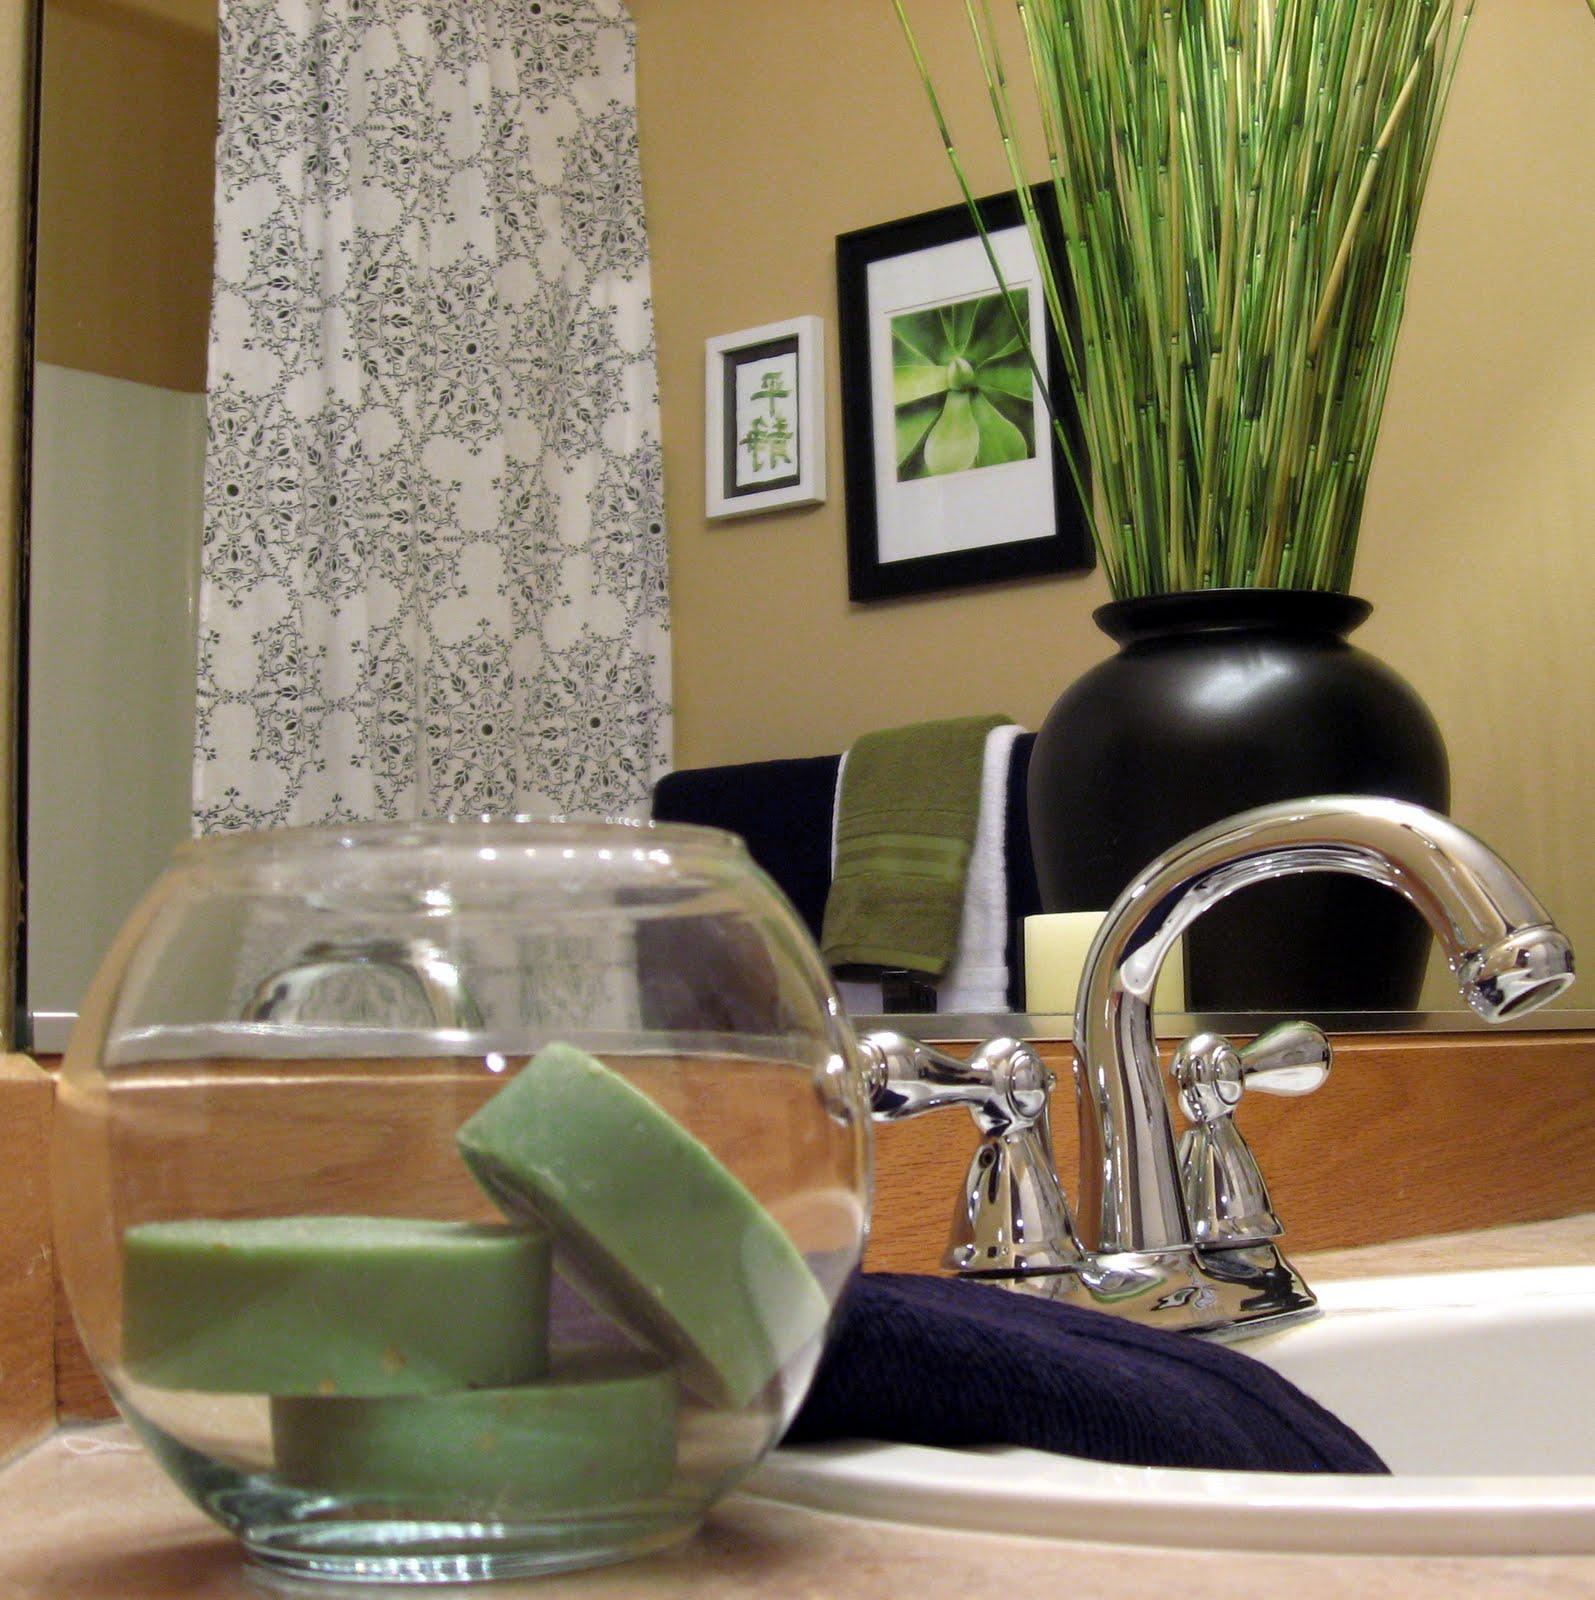 tasty-spa-bathroom-design-ideas-spa-bathroom-accessories-design